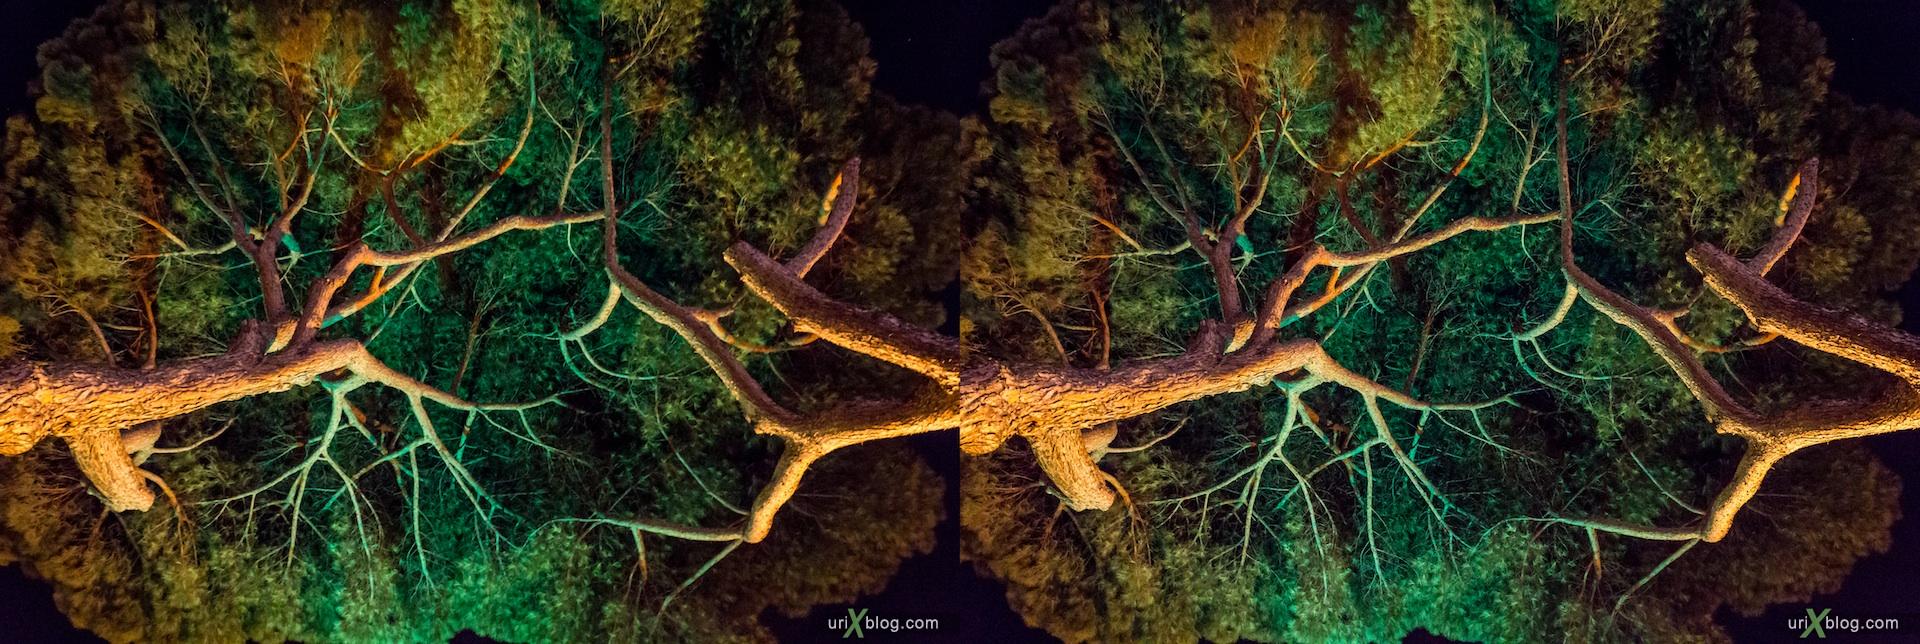 2012, Vittoriano, trees, night, Via di San Pietro in Carcere street, Rome, Italy, Europe, 3D, stereo pair, cross-eyed, crossview, cross view stereo pair